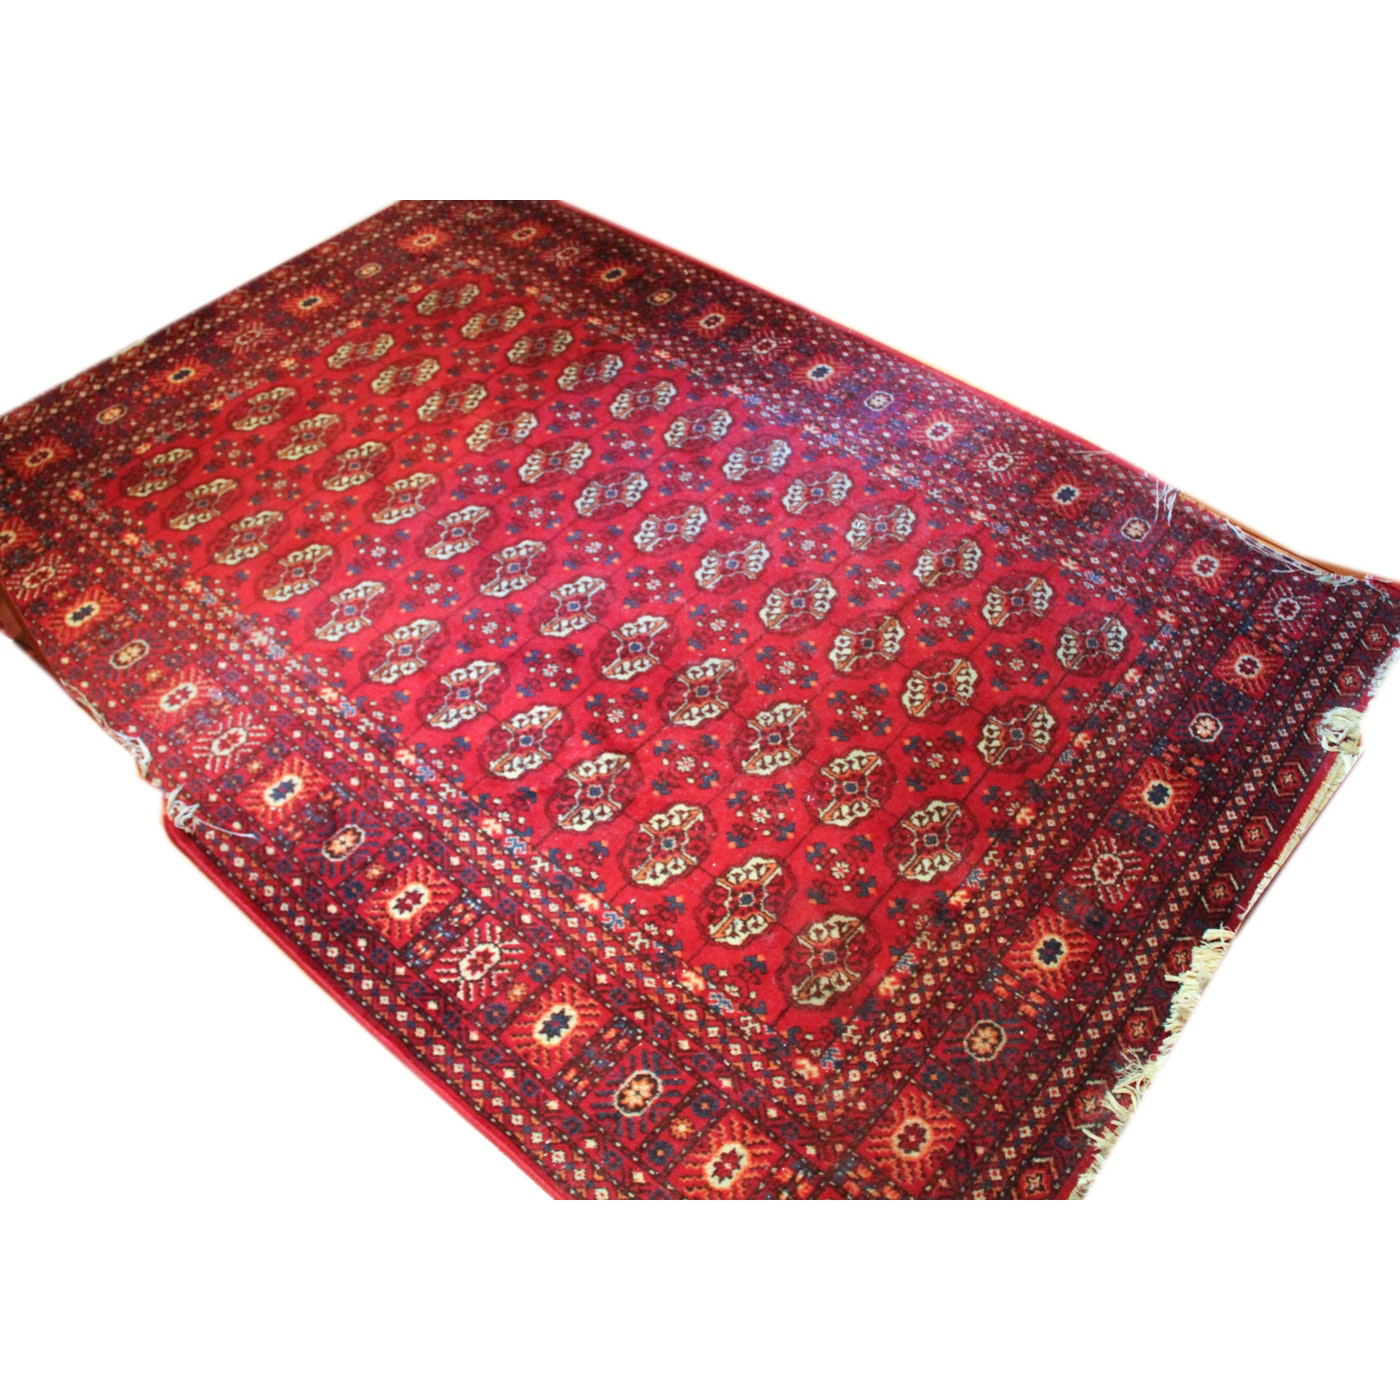 Machine Woven Bokhara-Style Area Rug